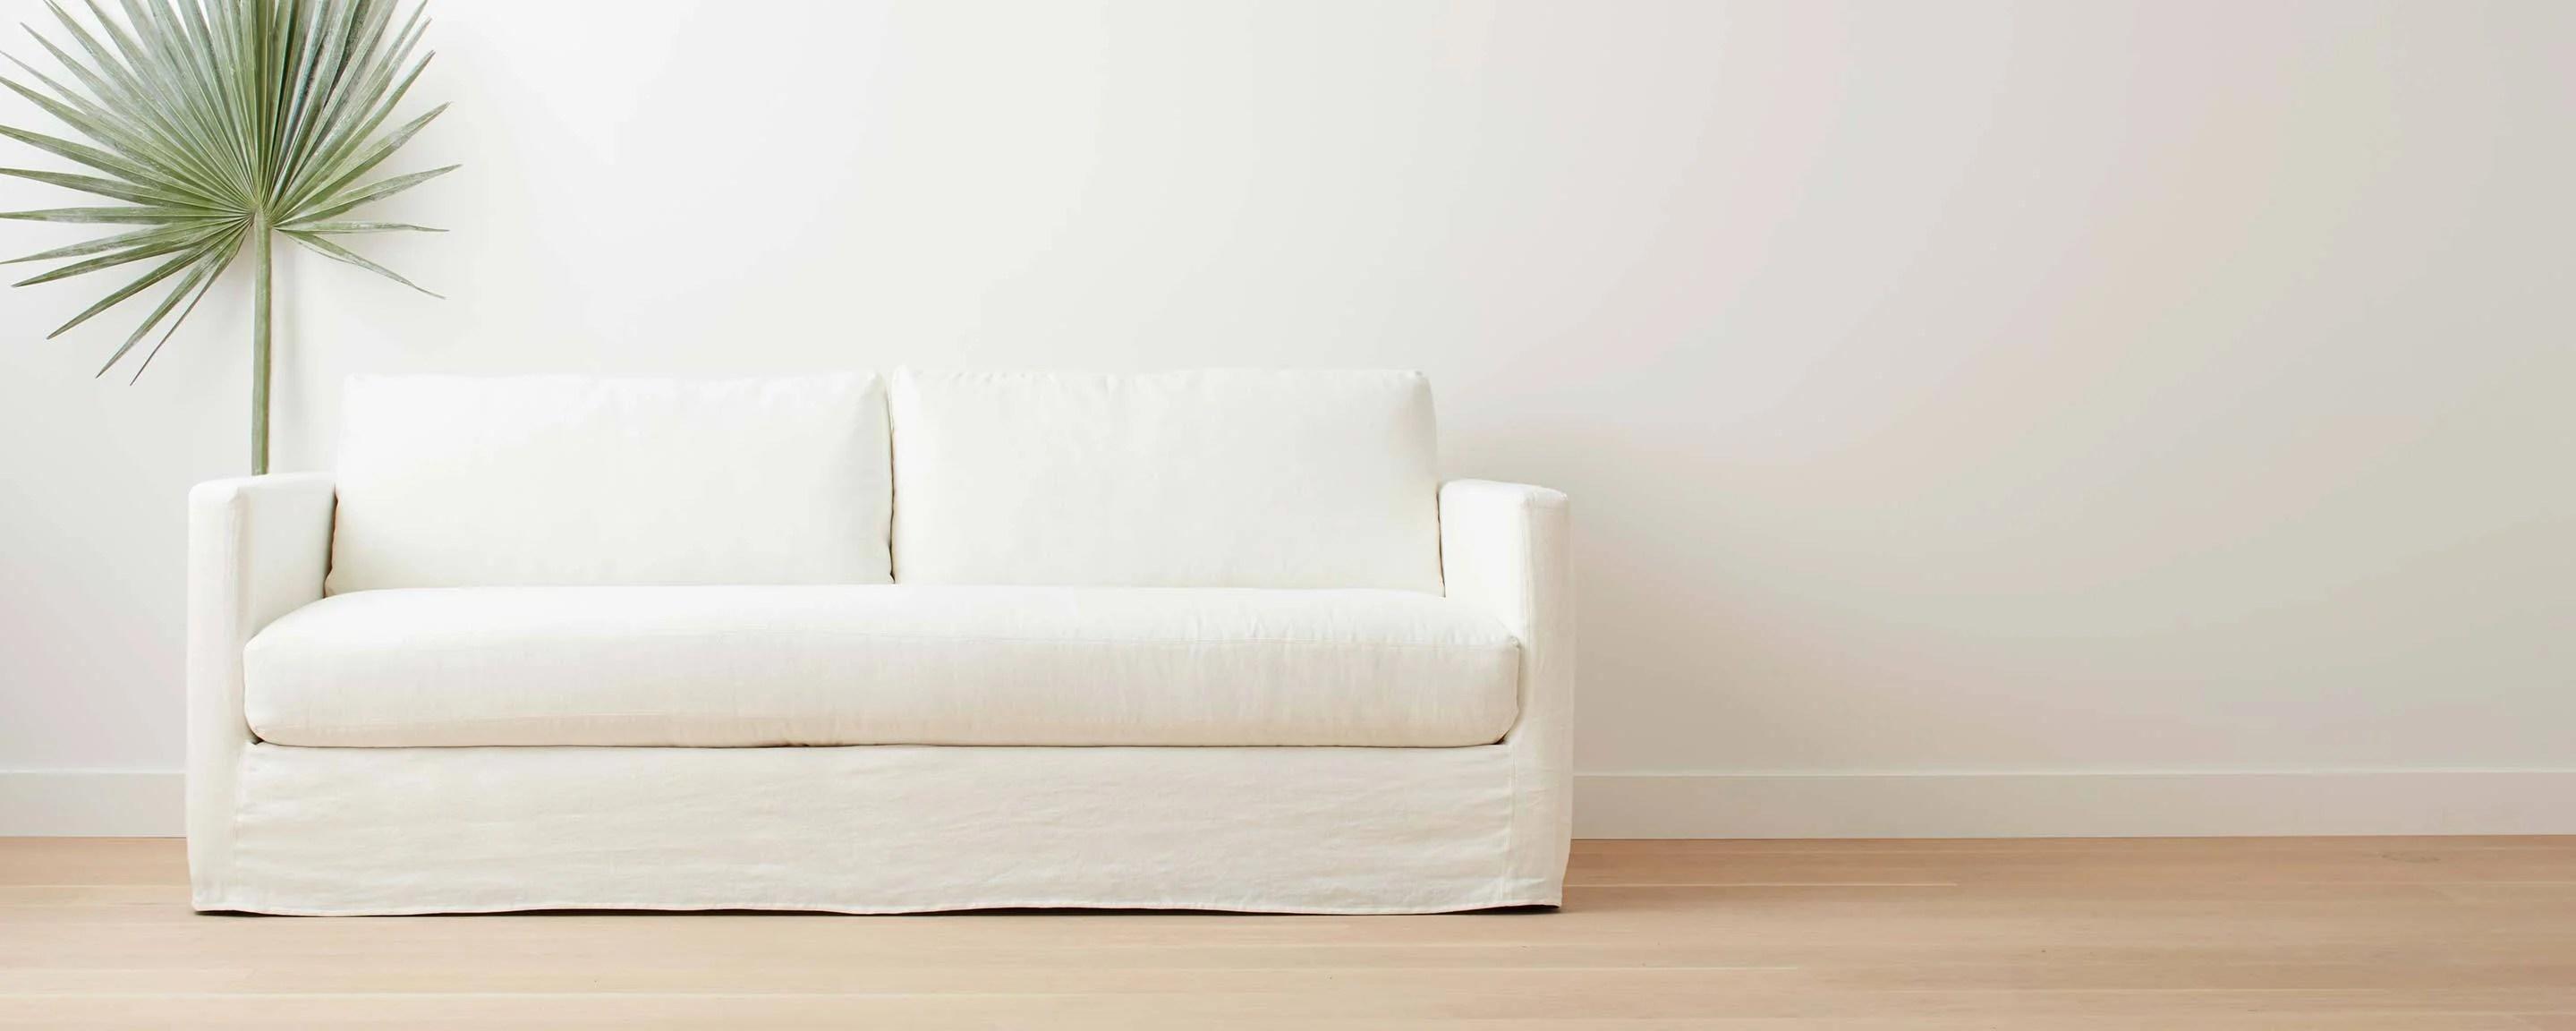 alex sofa montauk leather sofas made in the usa prices  home decor 88